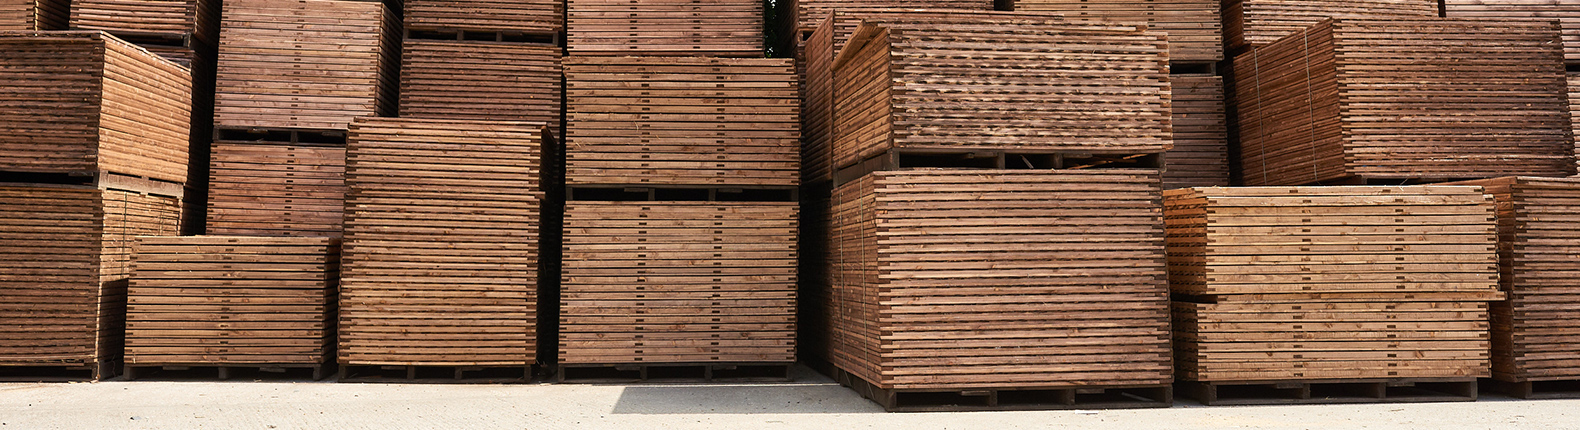 Pressure Treated Timber vs. Dip Treated Timber